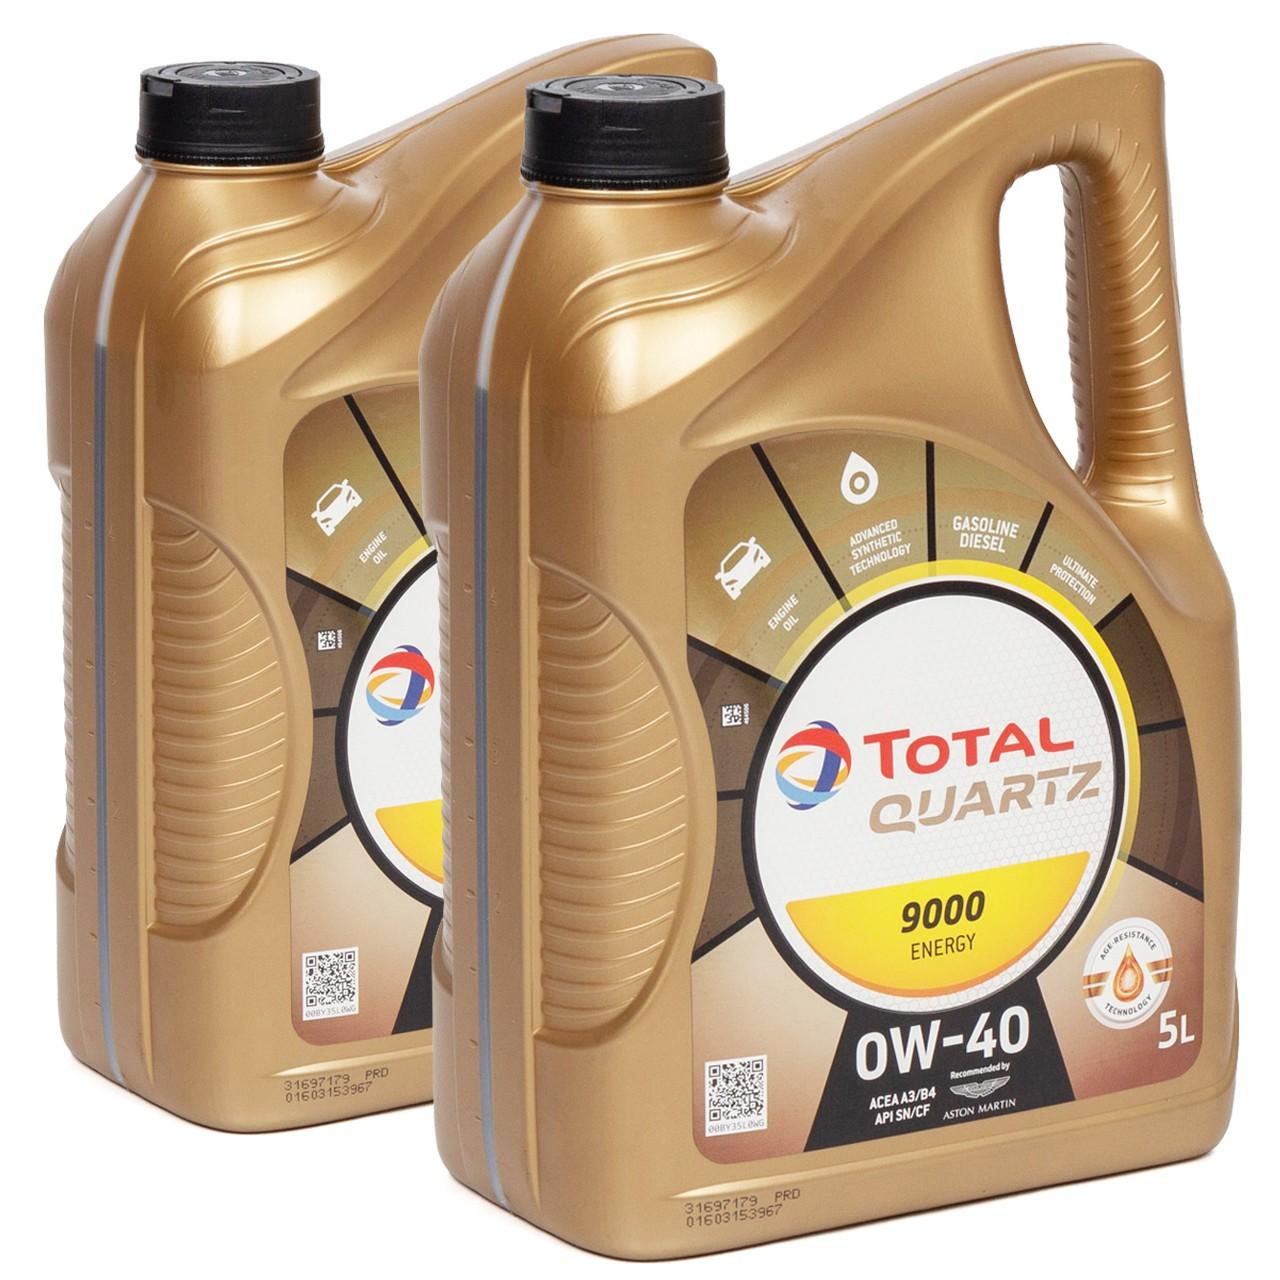 TOTAL QUARTZ 9000 ENERGY 0W40 Motoröl Öl VW 502/505.00 MB 229.5 - 10L 10 Liter